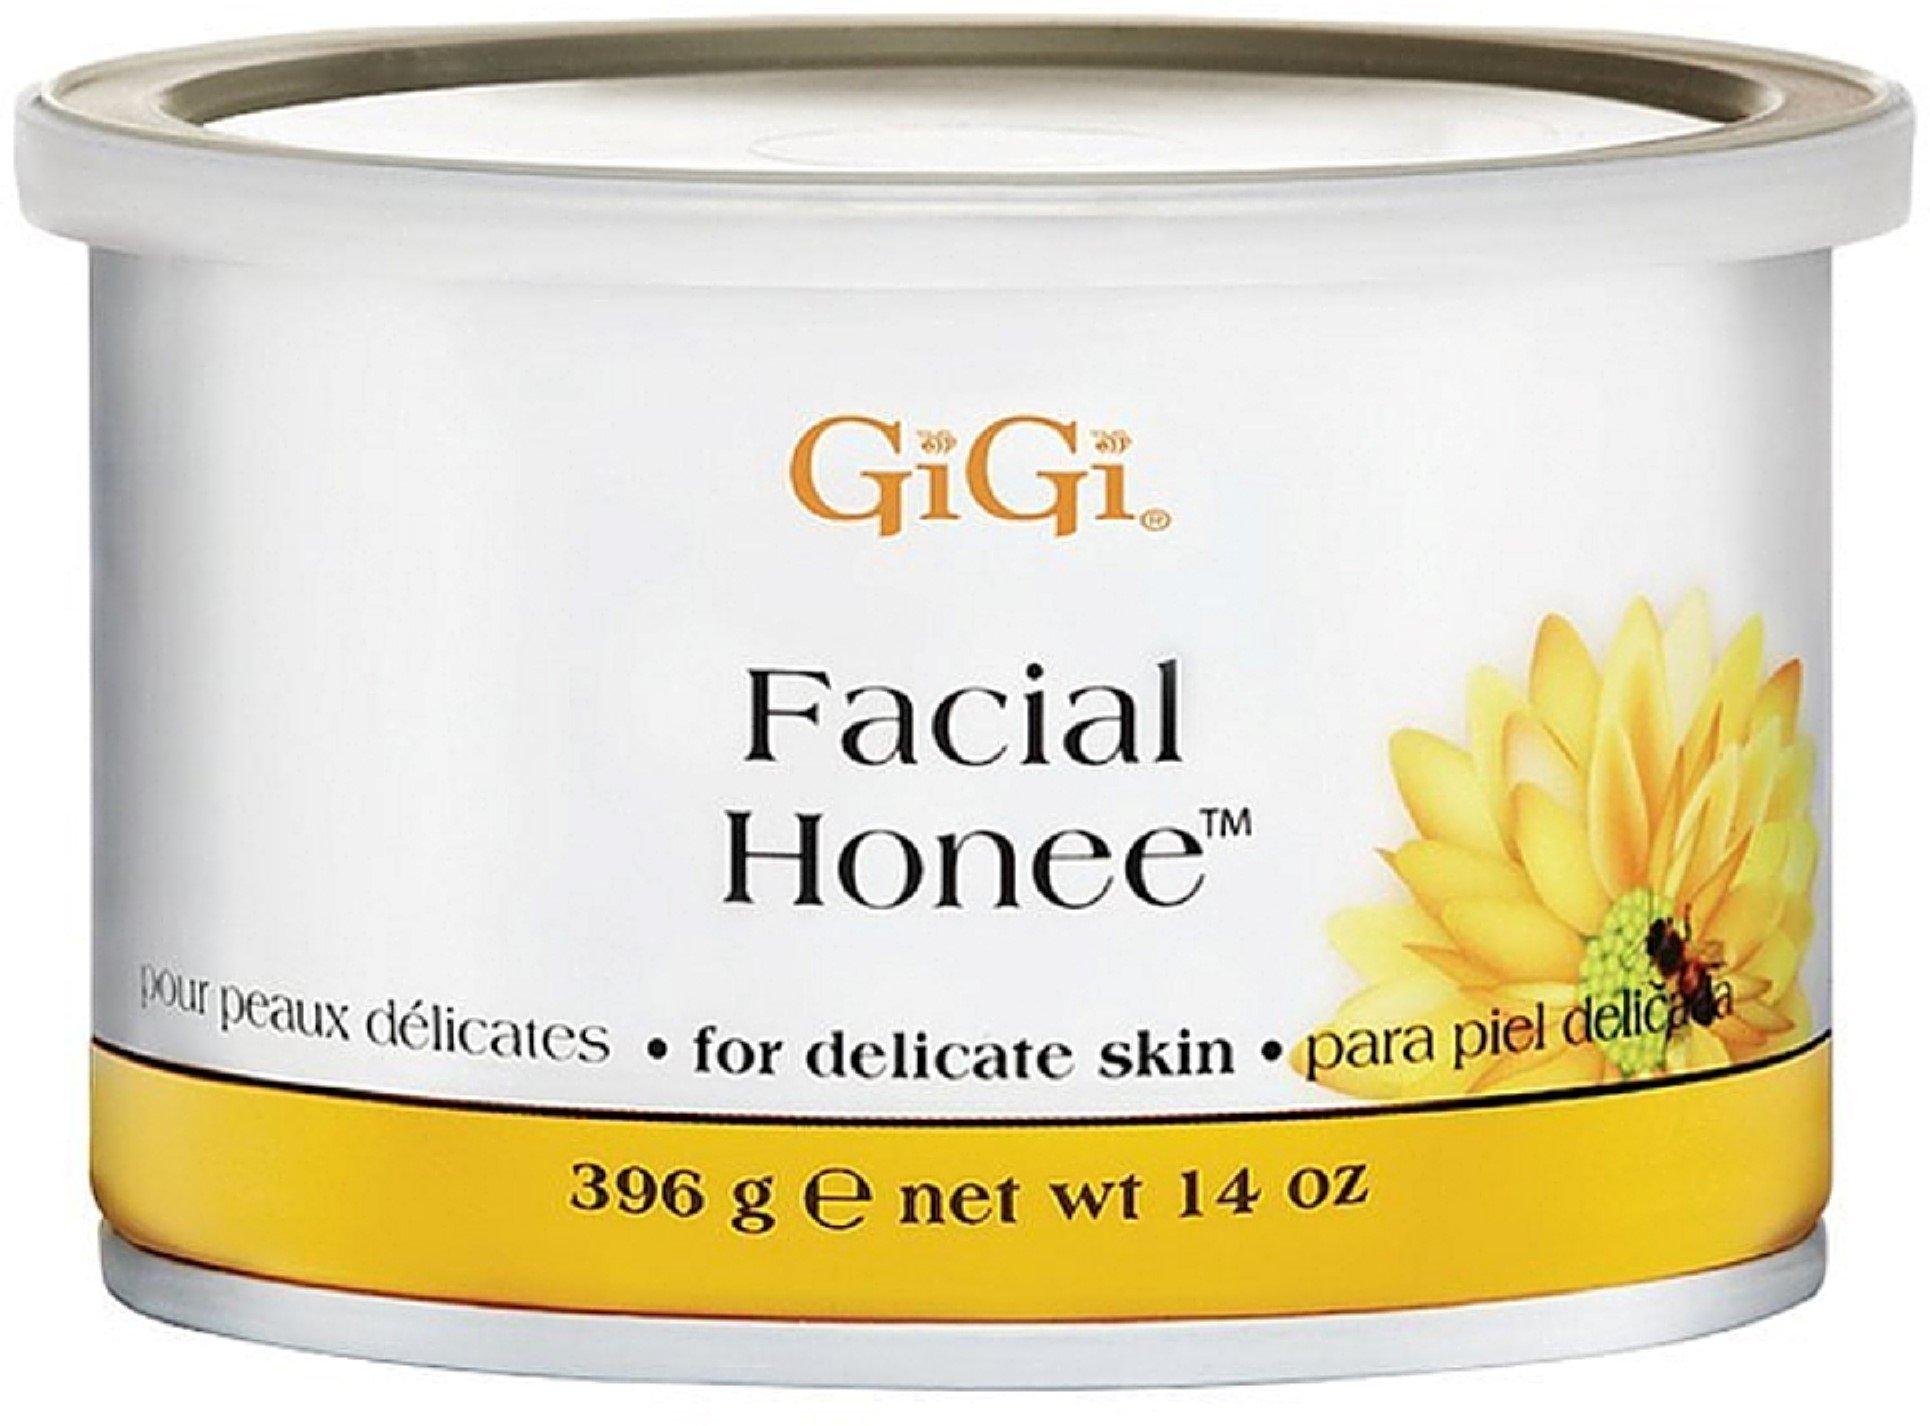 GiGi Facial Honee Wax 14 oz (Pack of 11)